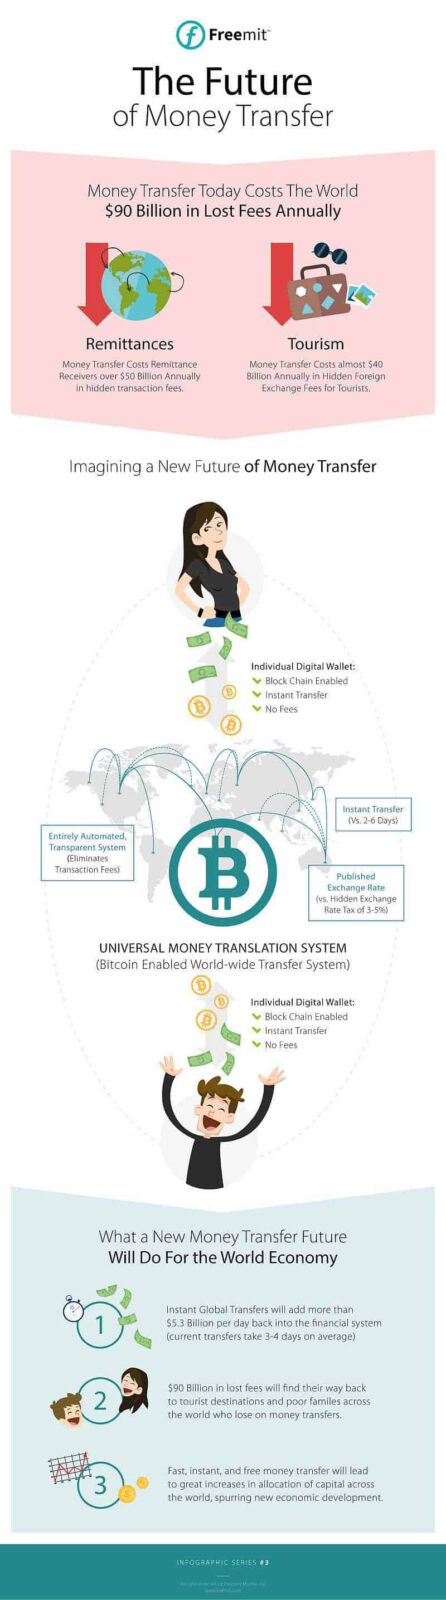 freemit_infographic_desktop_future_of_money_transfer_01-2